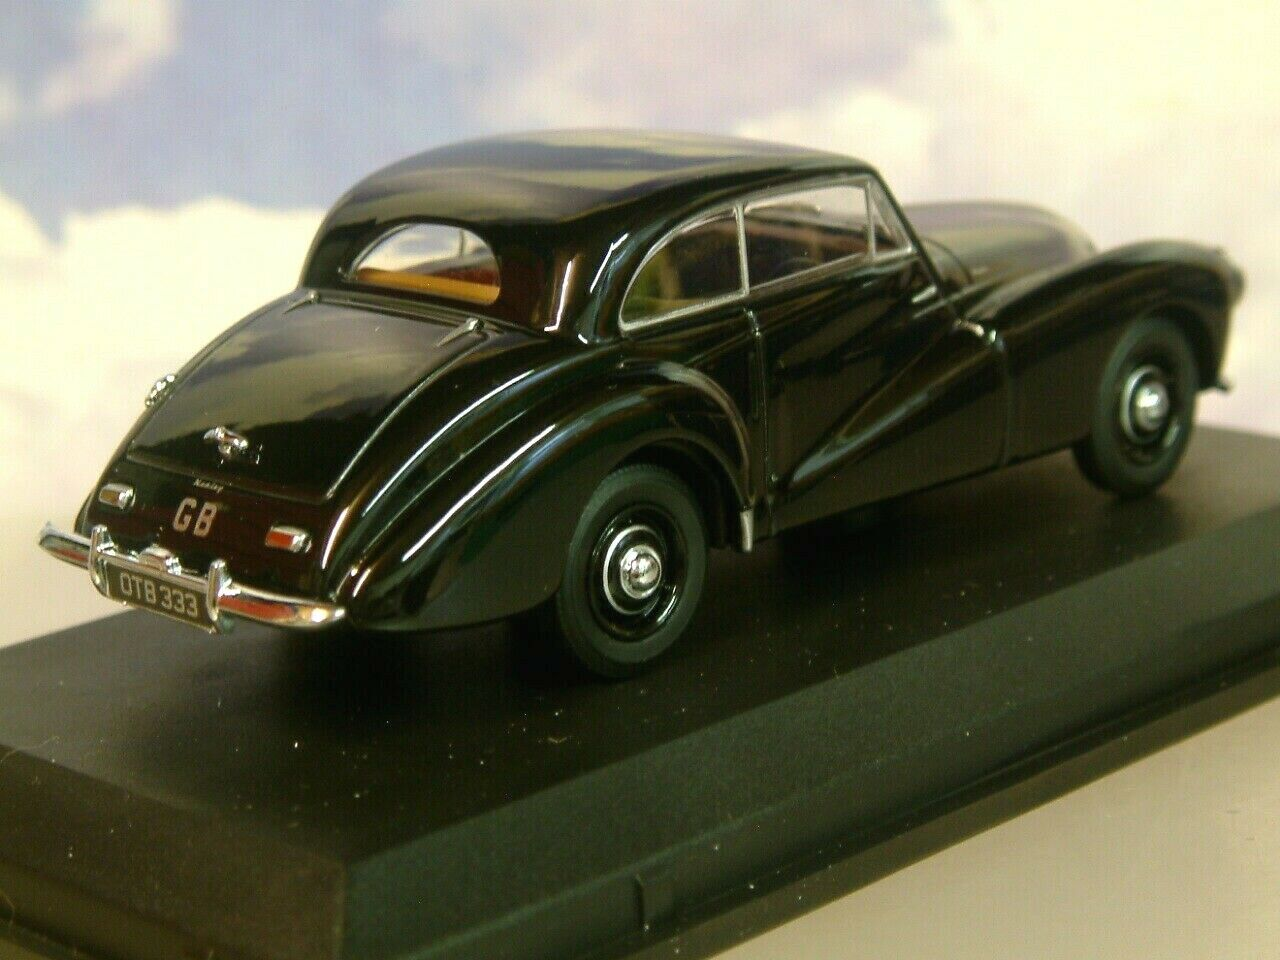 Estupendo Oxford Diecast 1 43 1950-1954 1950-1954 1950-1954 Healey Tickford Saloon en Negro Ht002 faa628